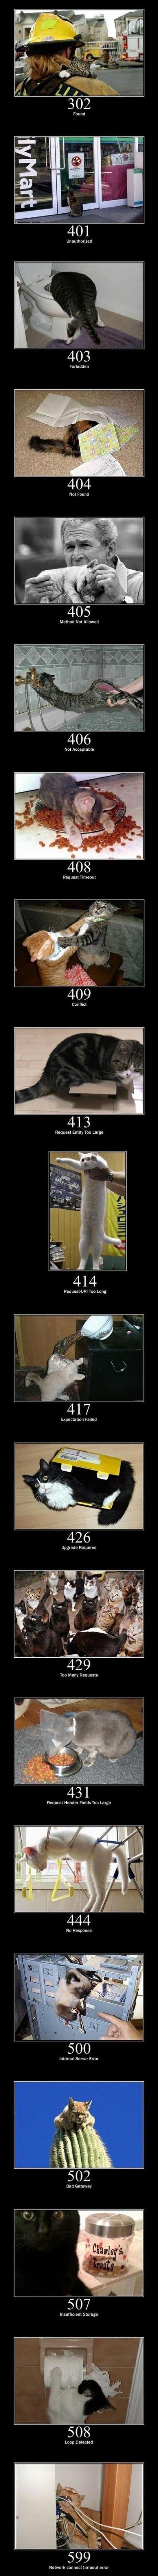 funny-error-cats-meme-jokes